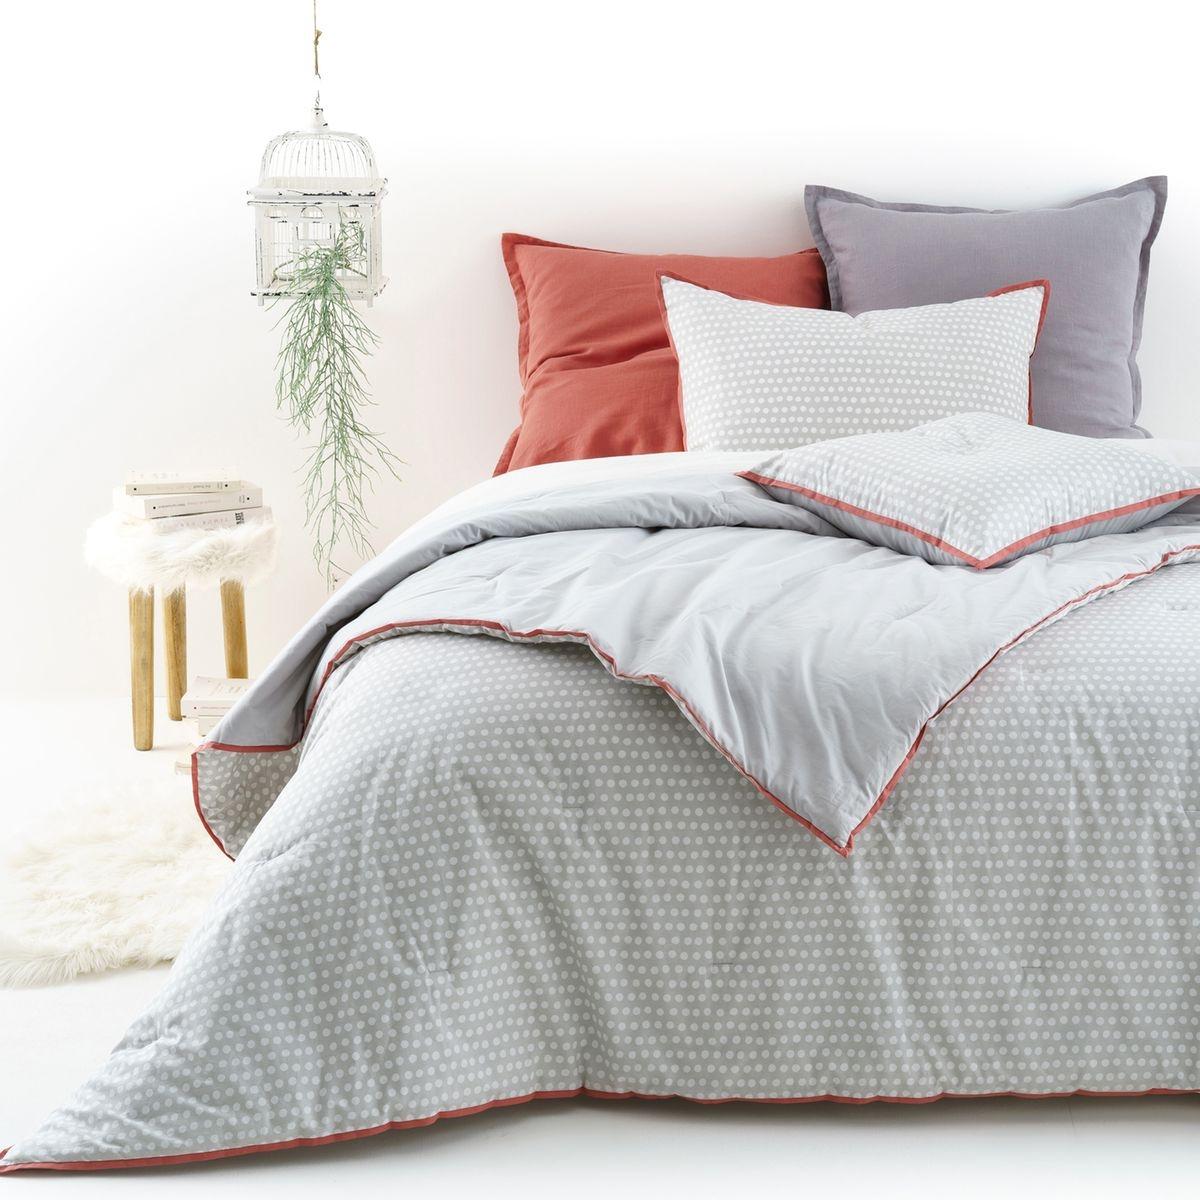 couvre lit en percale duo. Black Bedroom Furniture Sets. Home Design Ideas